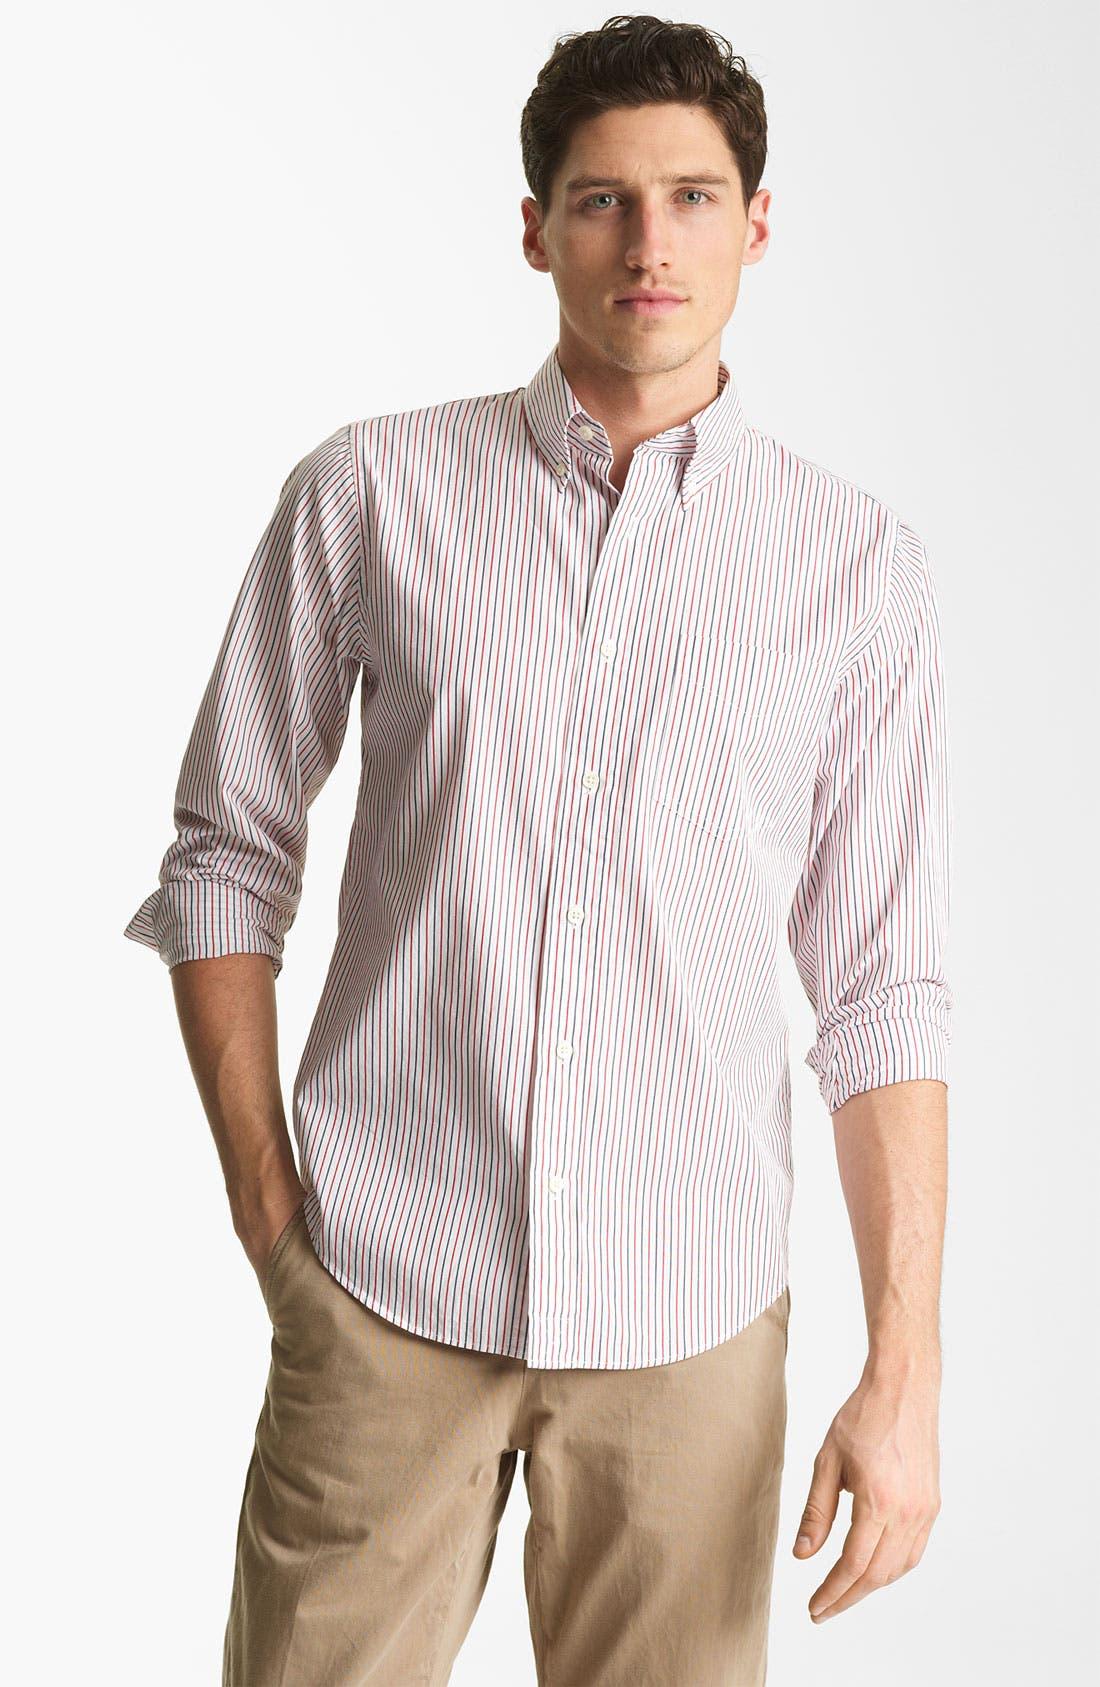 Alternate Image 1 Selected - Jack Spade 'Cale' Stripe Sport Shirt